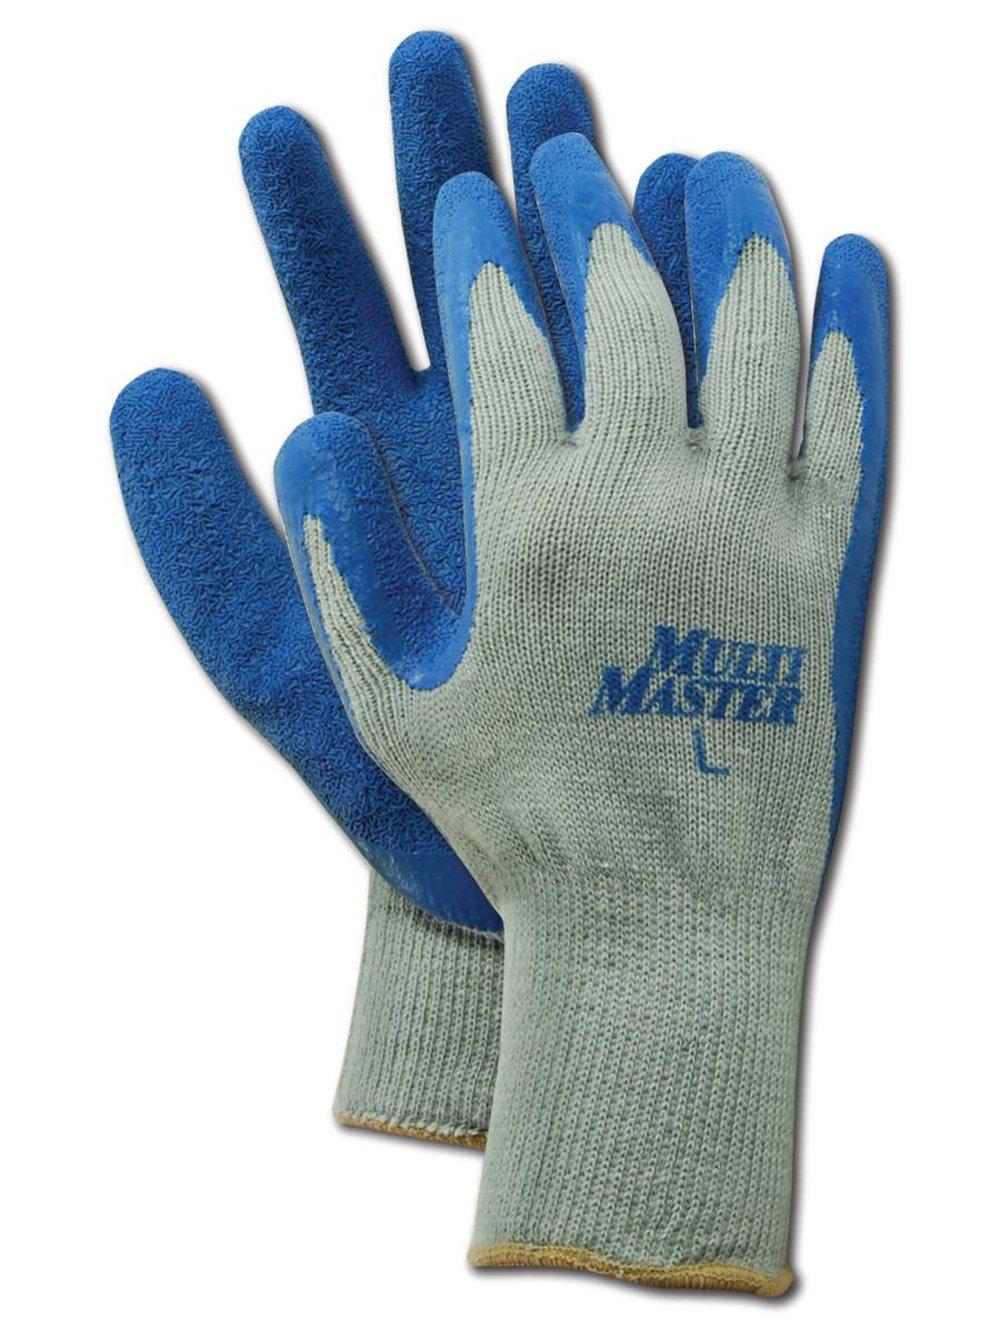 MAGID MultiMaster Popular product 9529 Cotton Polyester C Atlanta Mall Blue Glove Palm Latex